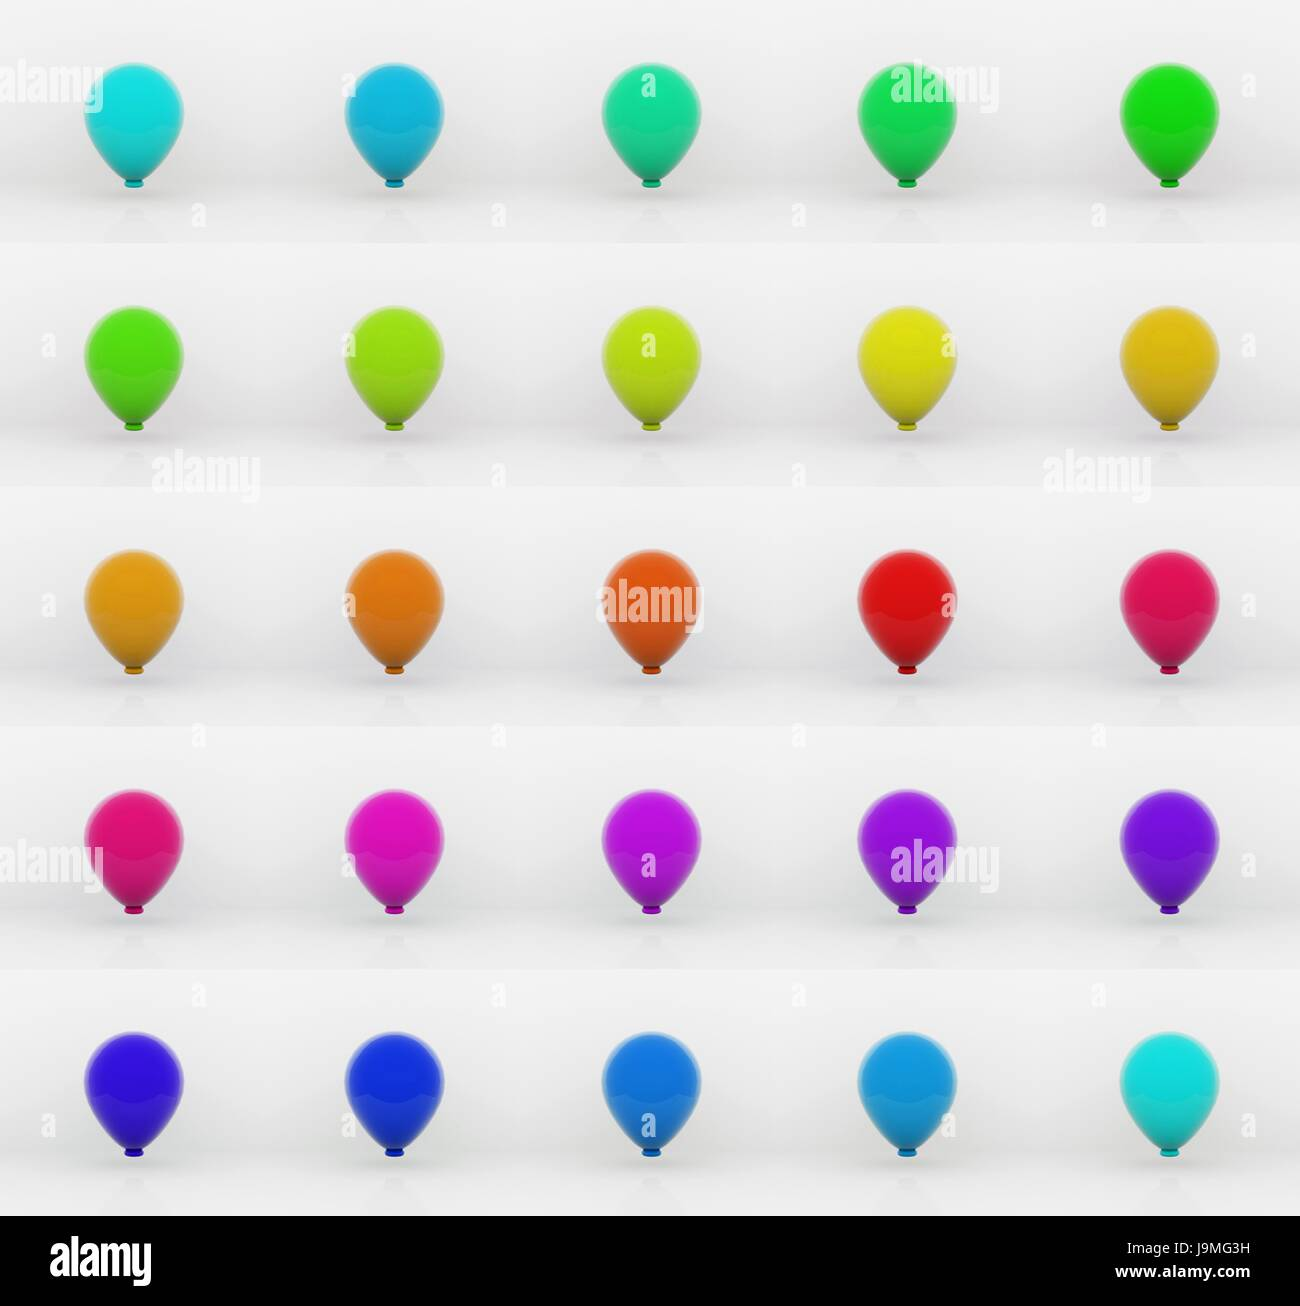 Wunderbar Luftballons Färbung Seite Bilder - Framing Malvorlagen ...